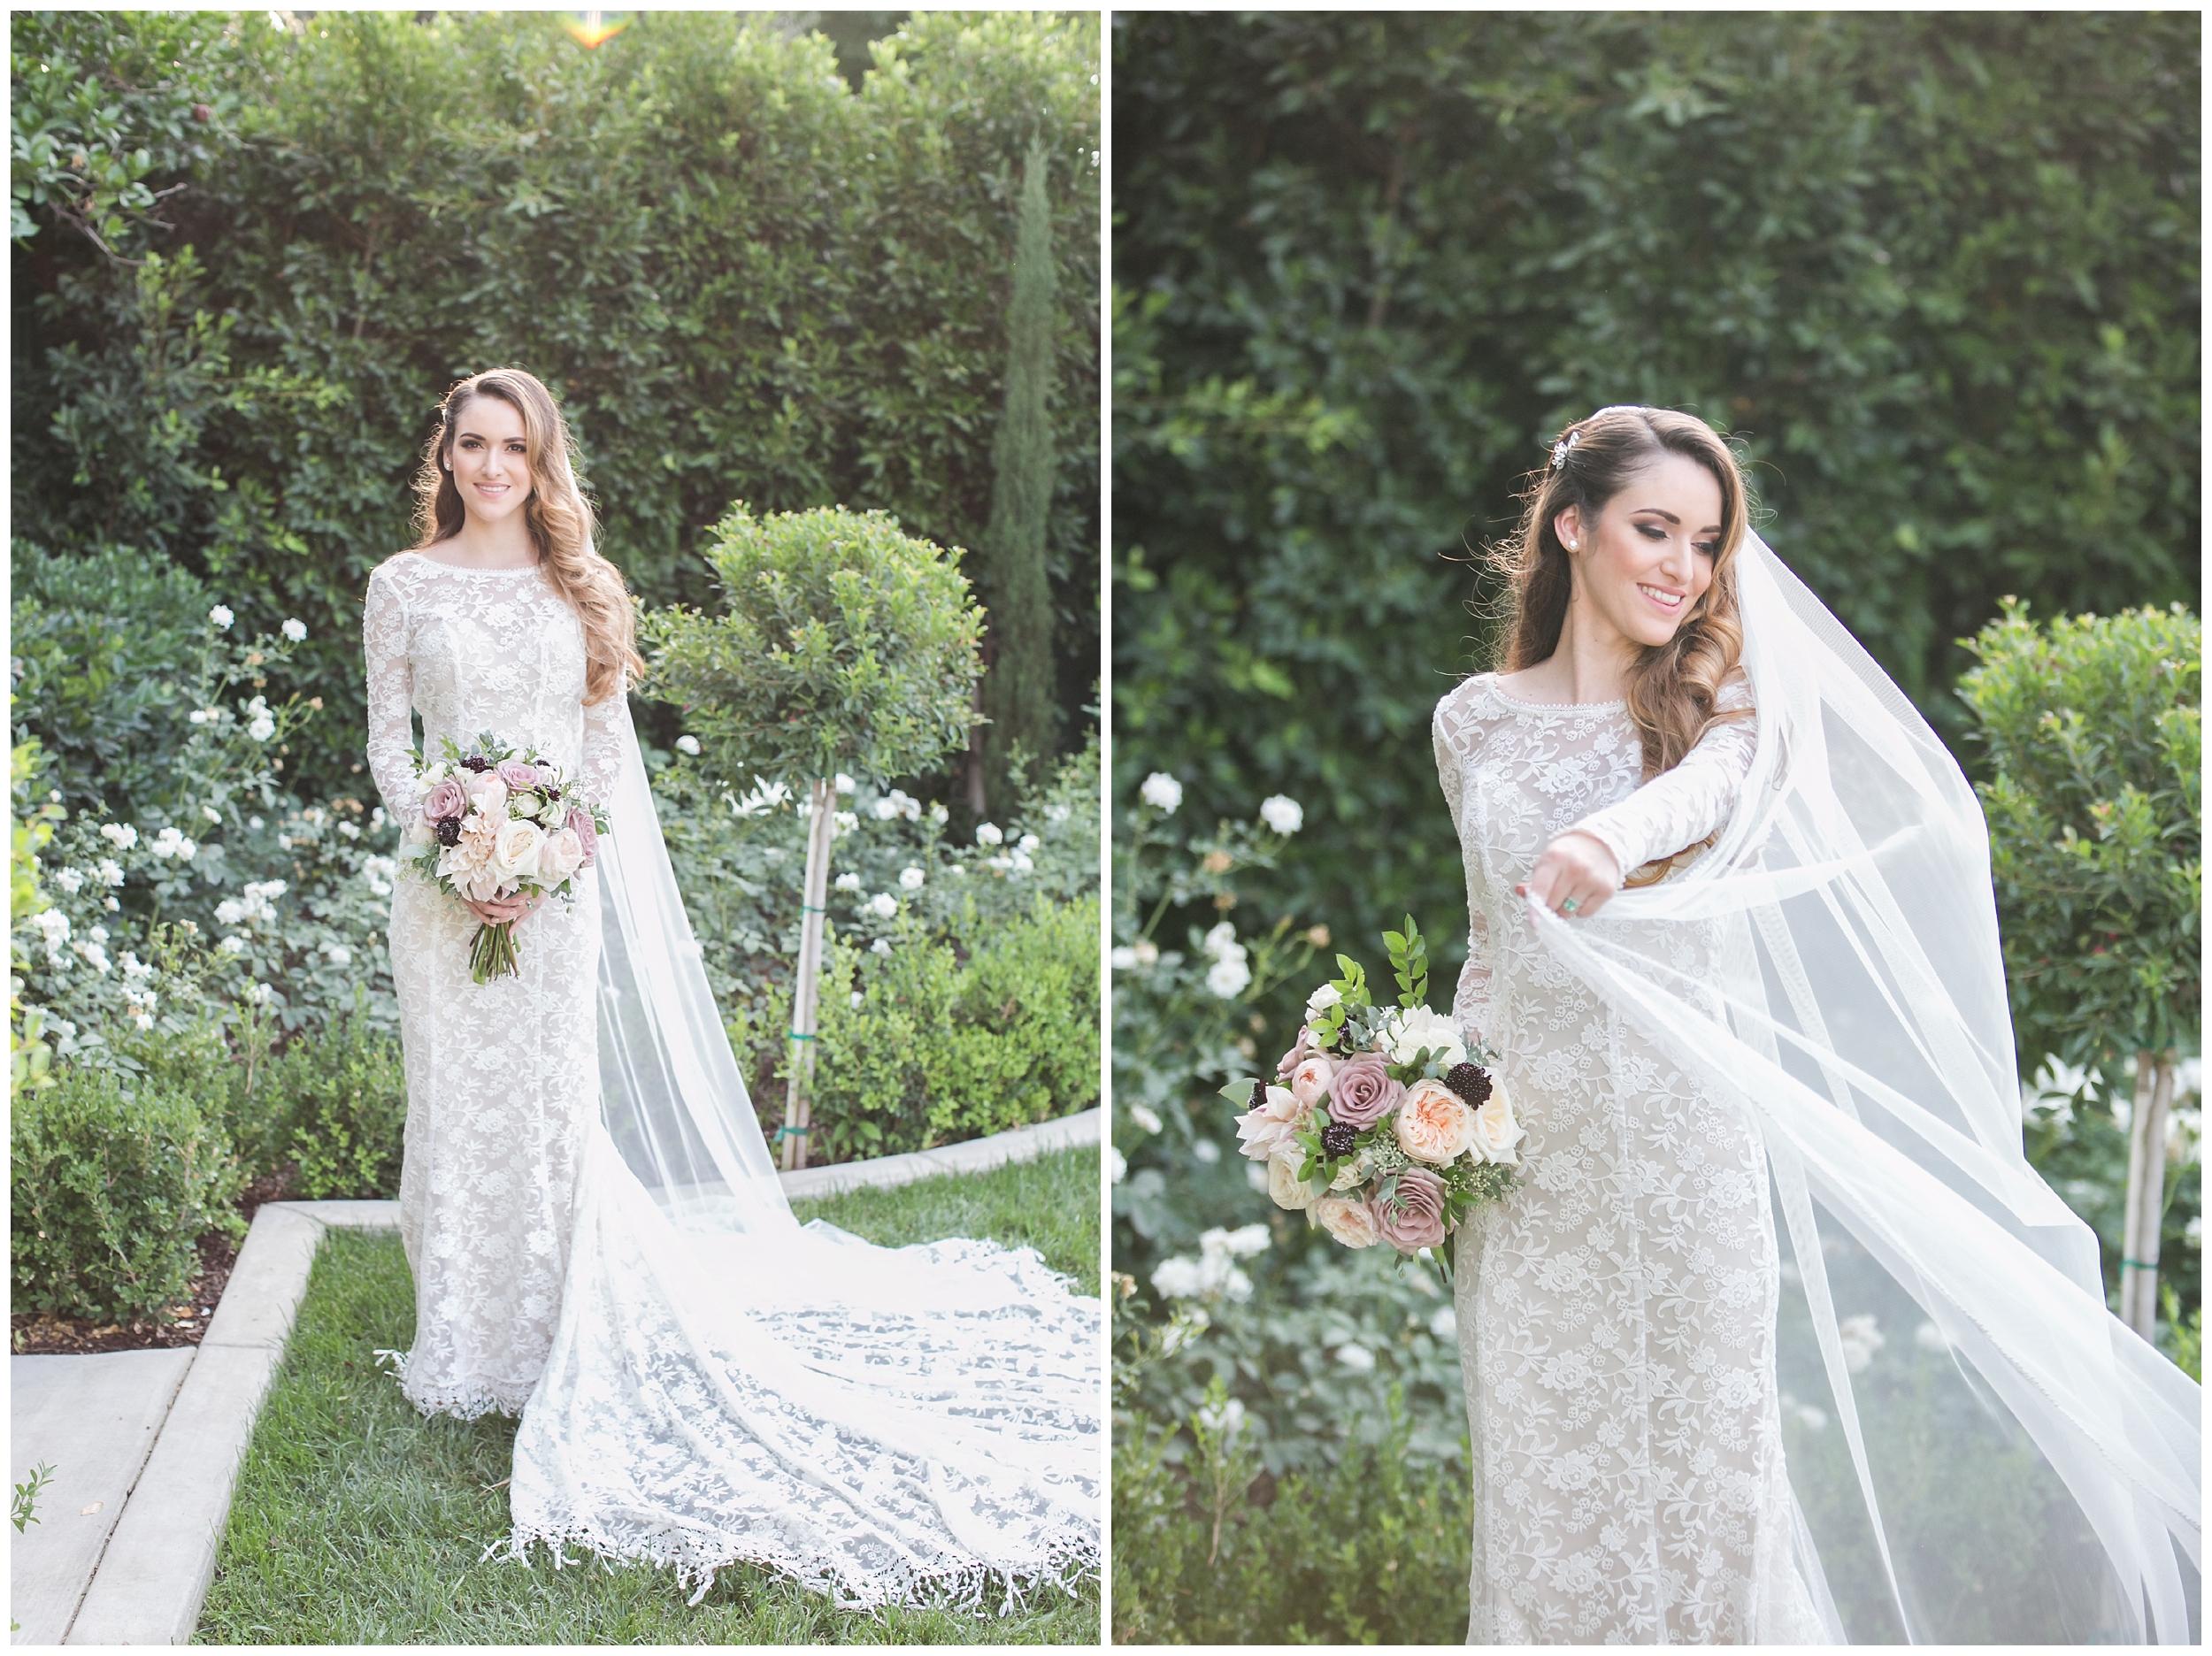 chic-christmas-house-wedding-bride-groom-portraits-carrie-vines-049.jpg